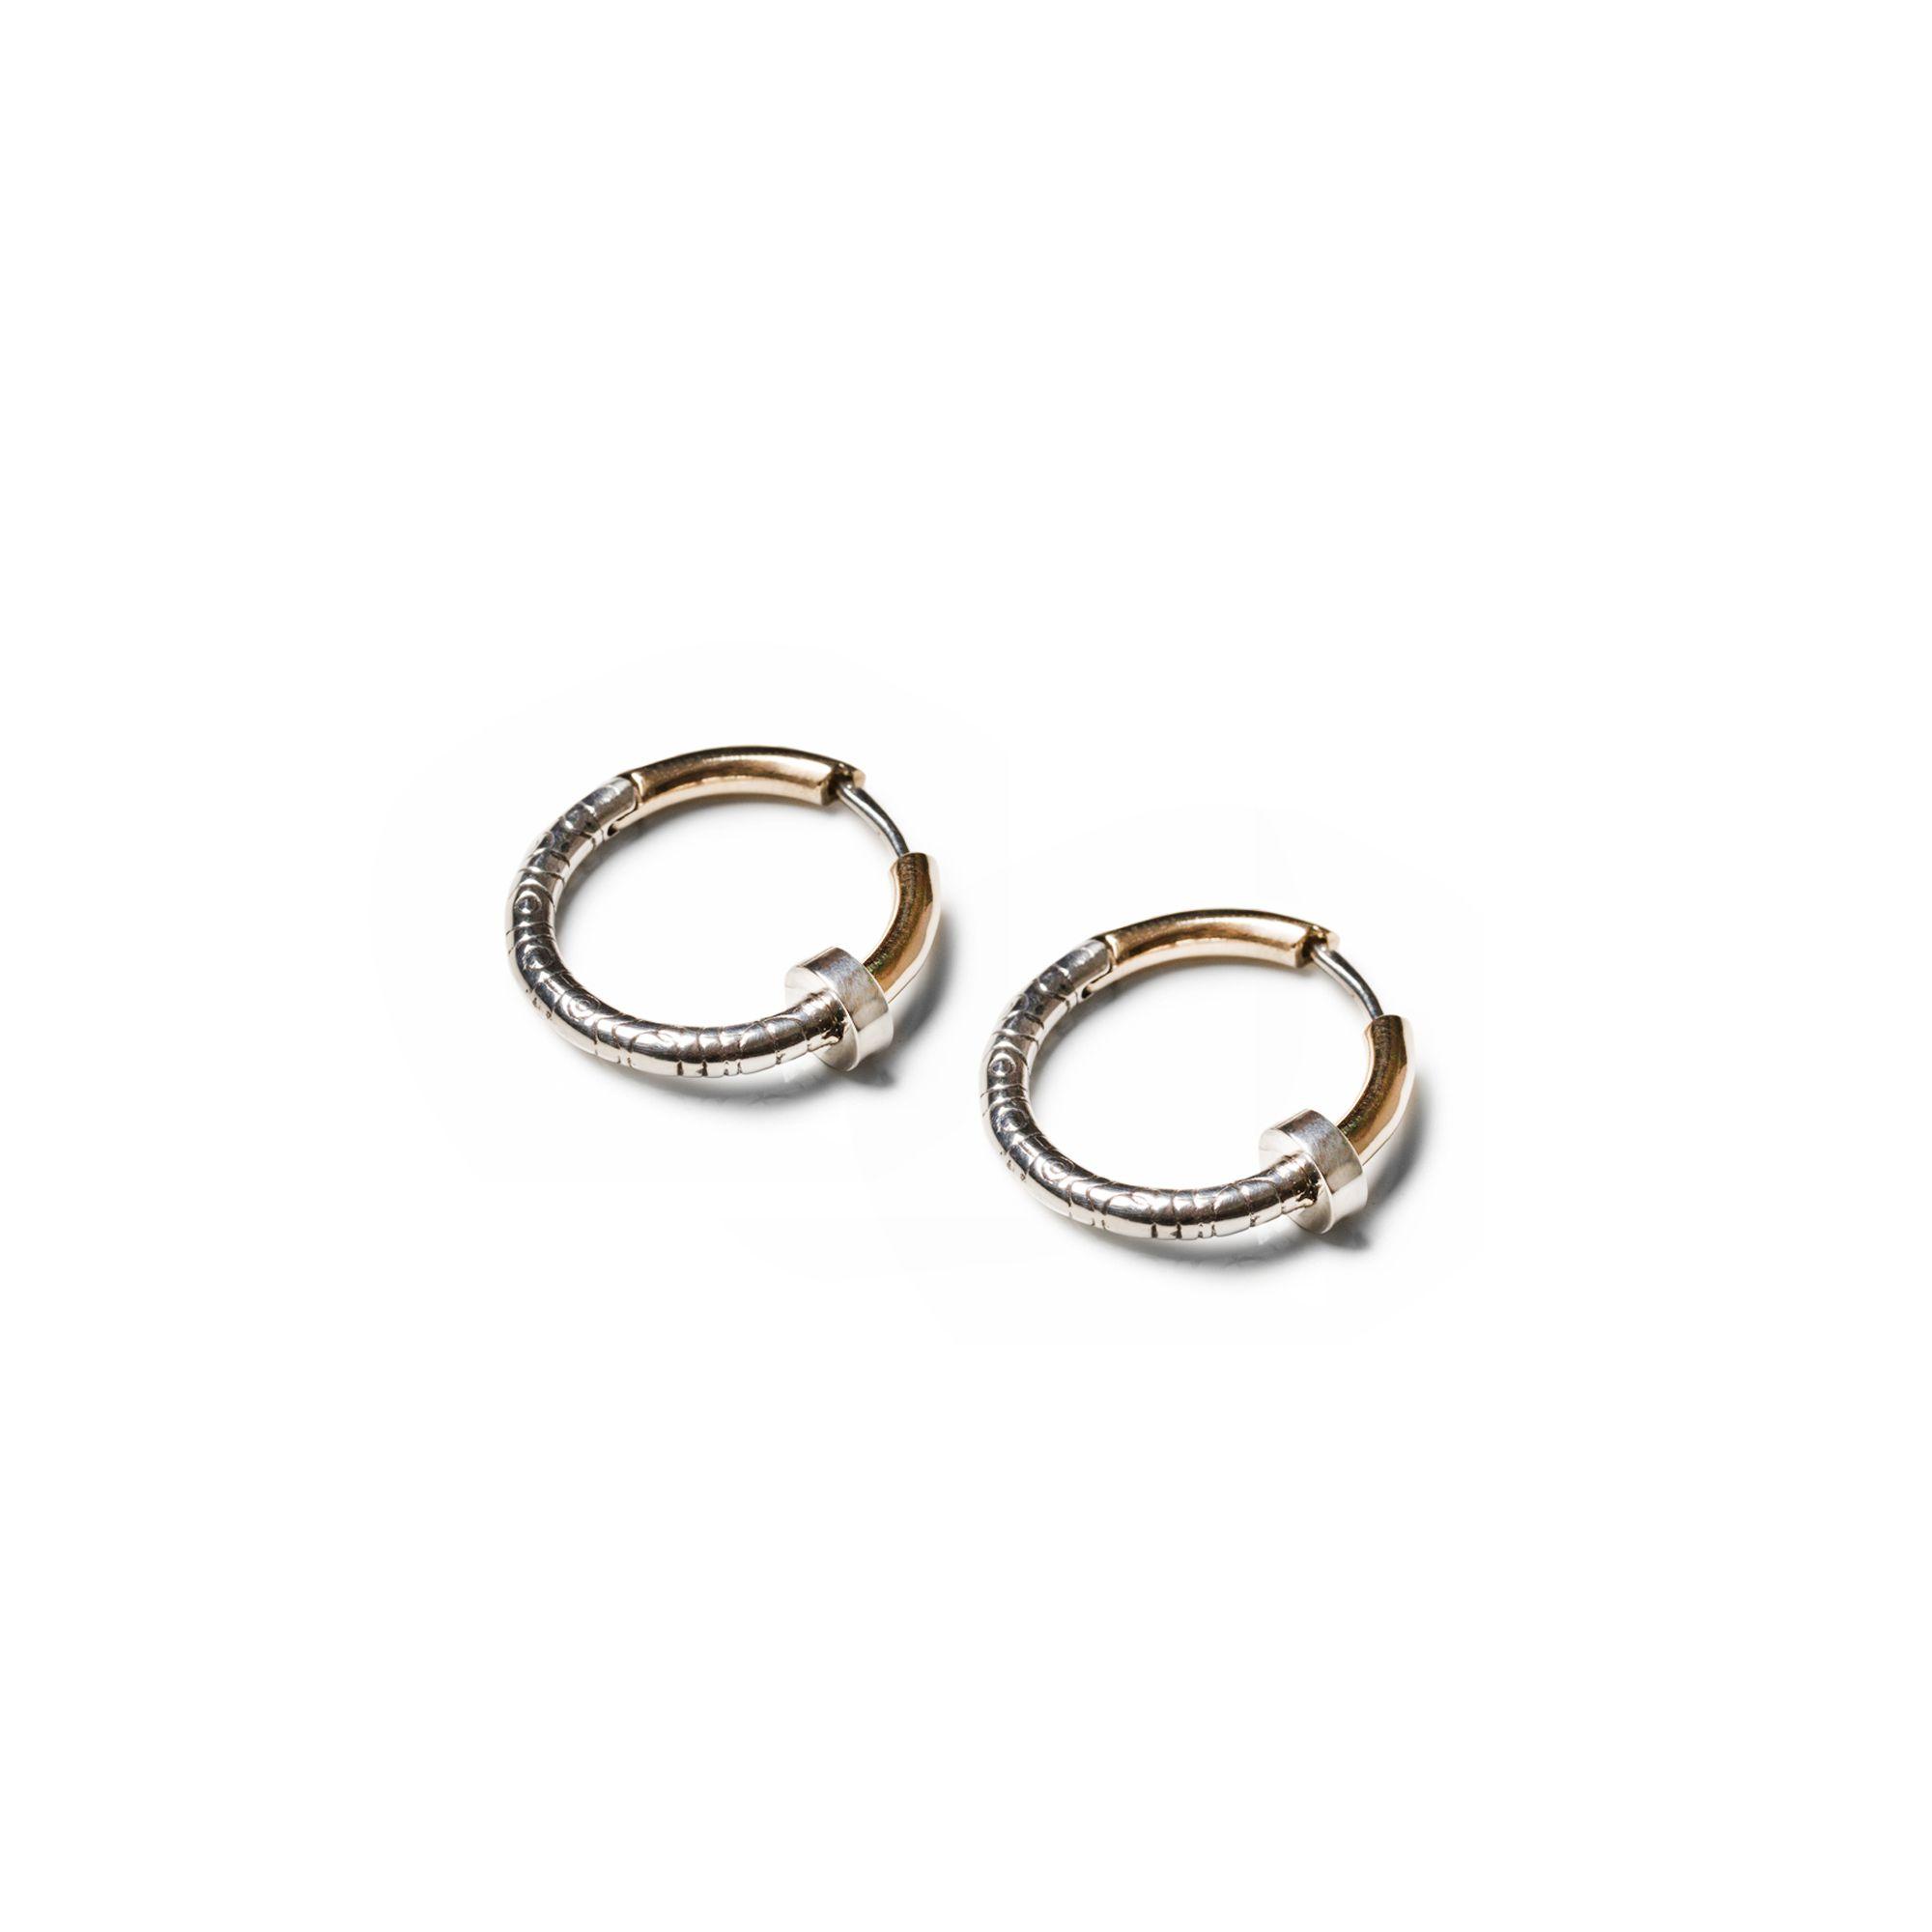 'Neon' hoops Earrings in silver and bronze